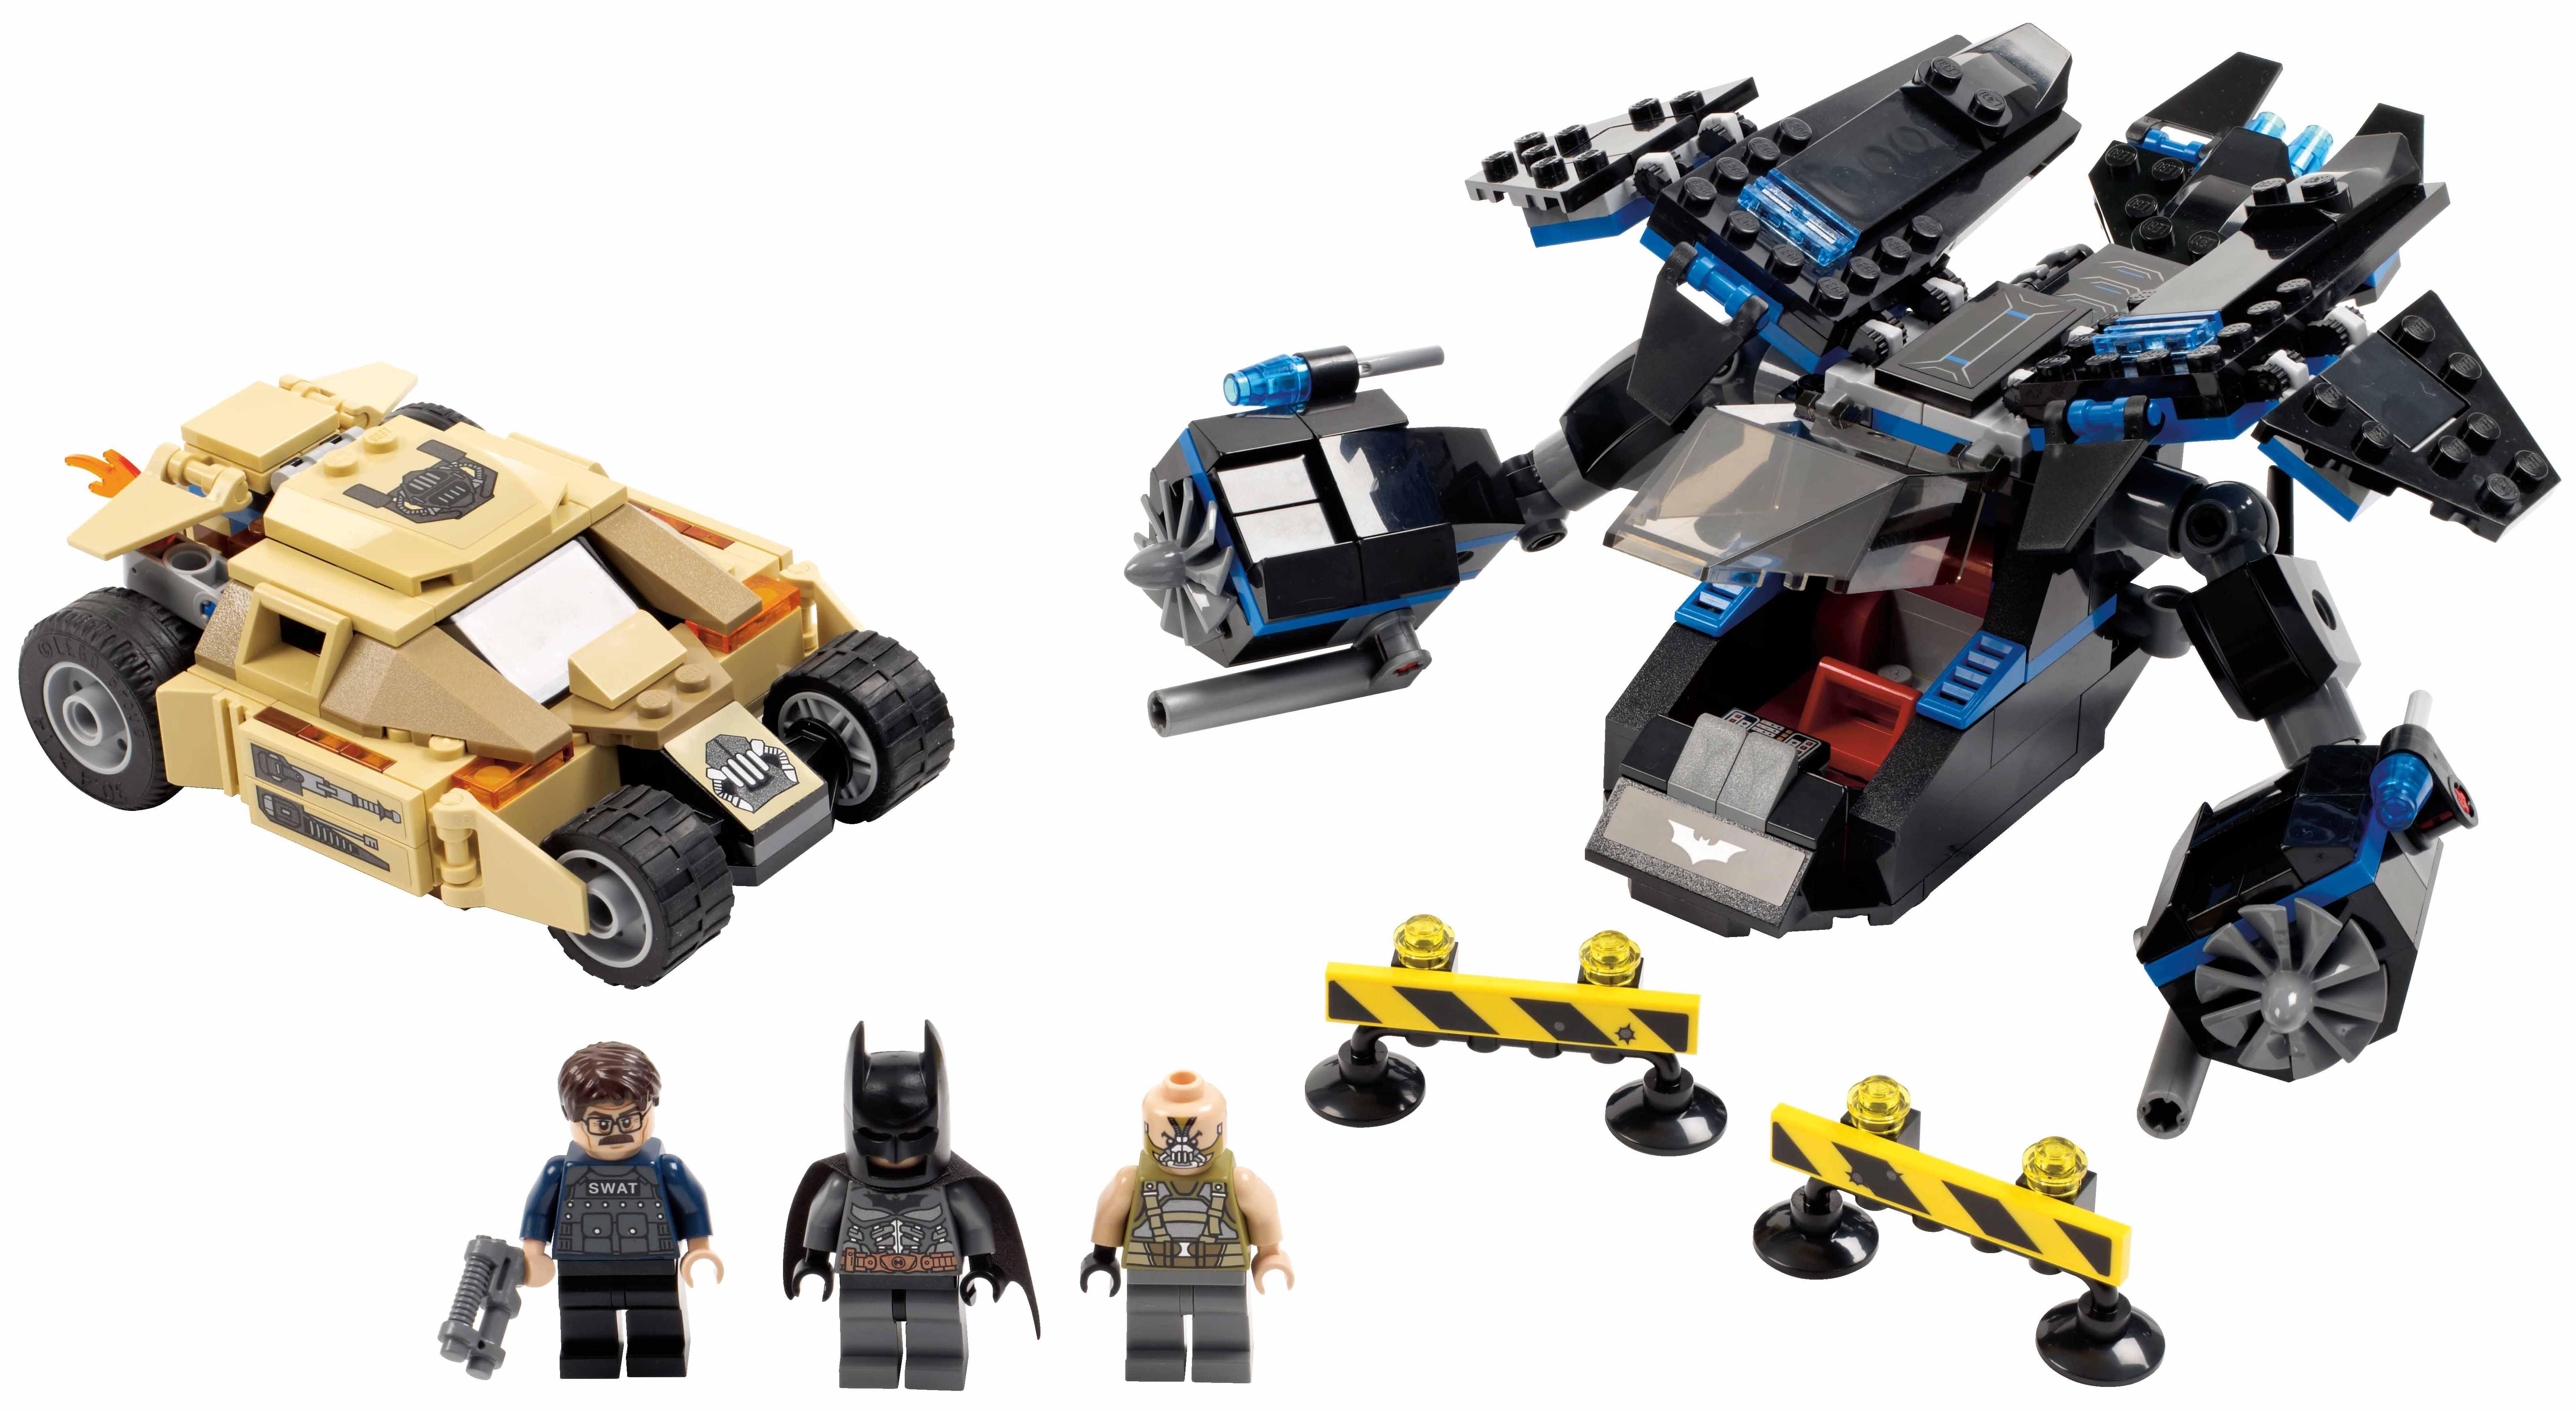 The Dark Knight Rises' LEGO sets coming in 2013 - Batman News